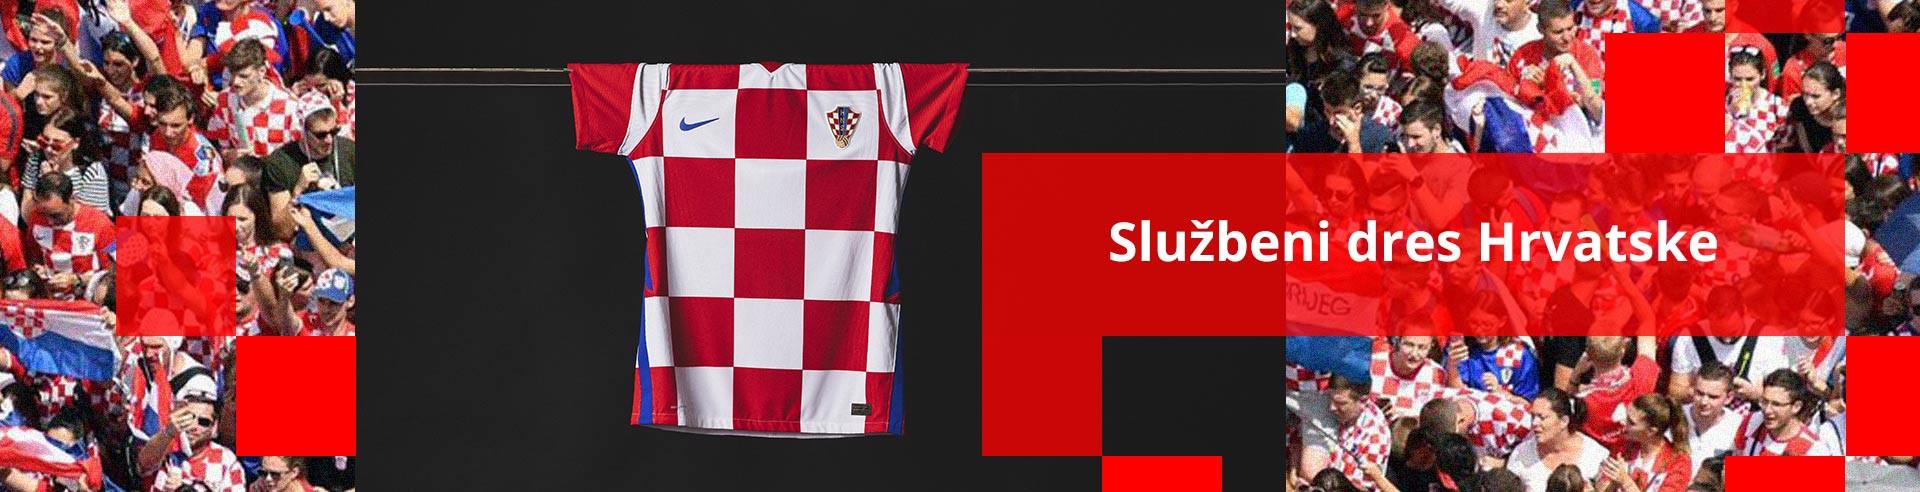 Službeni dres Hrvatske